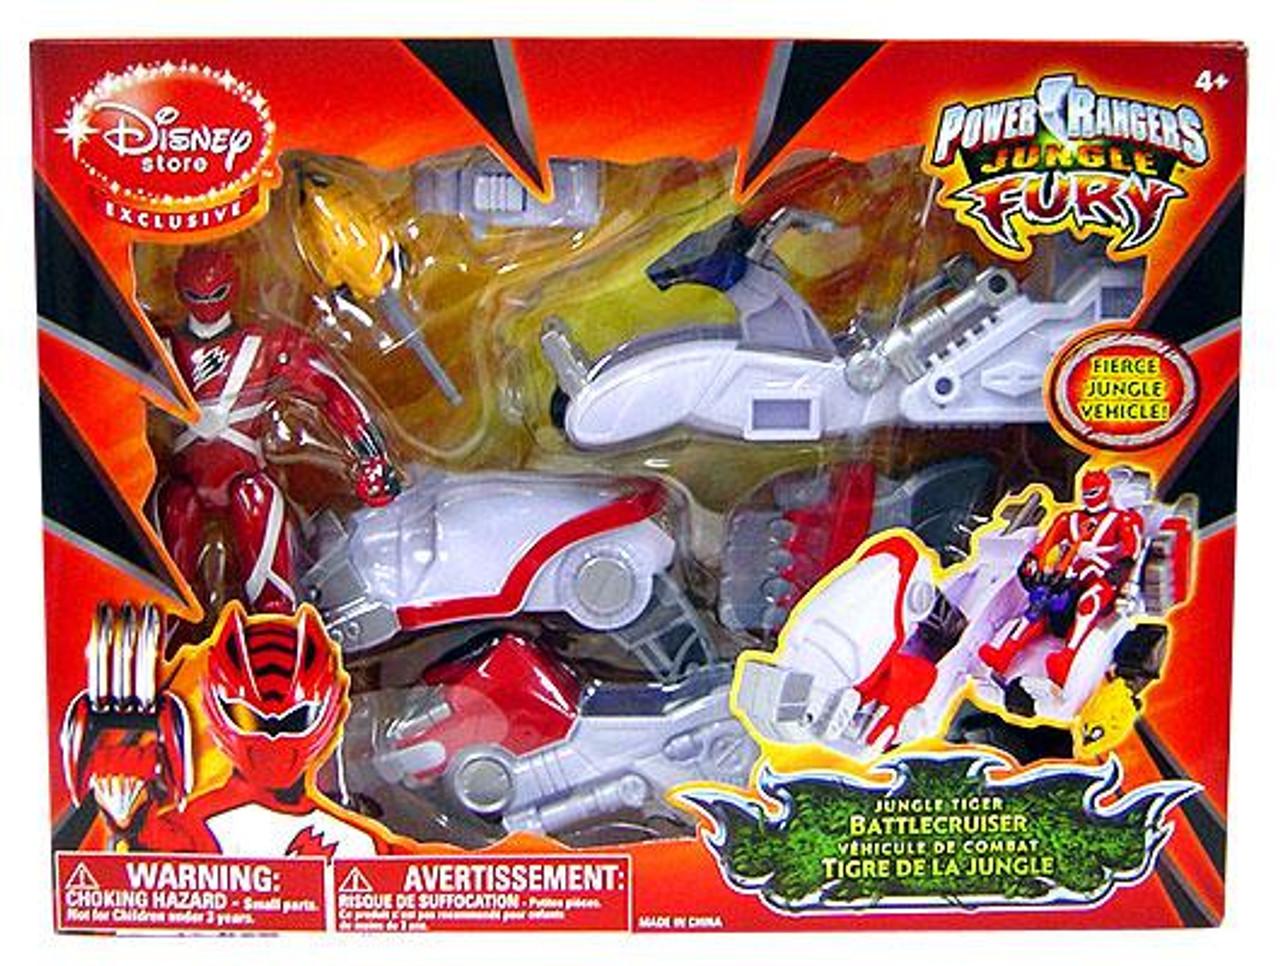 Power Rangers Jungle Fury Jungle Tiger Battlecruiser Exclusive Action Figure Vehicle